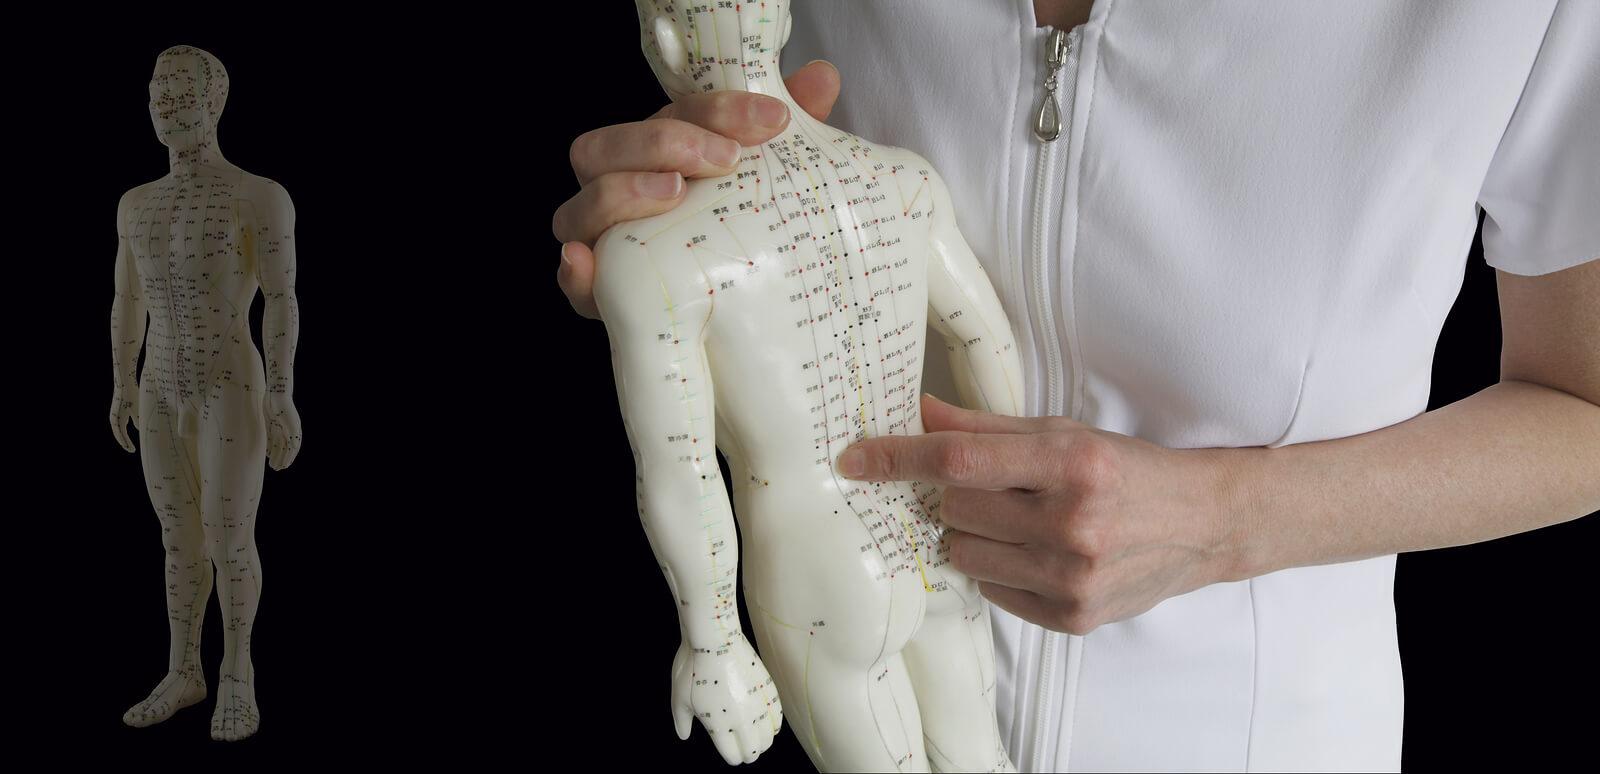 Acupuncture Model and Acupuncturist